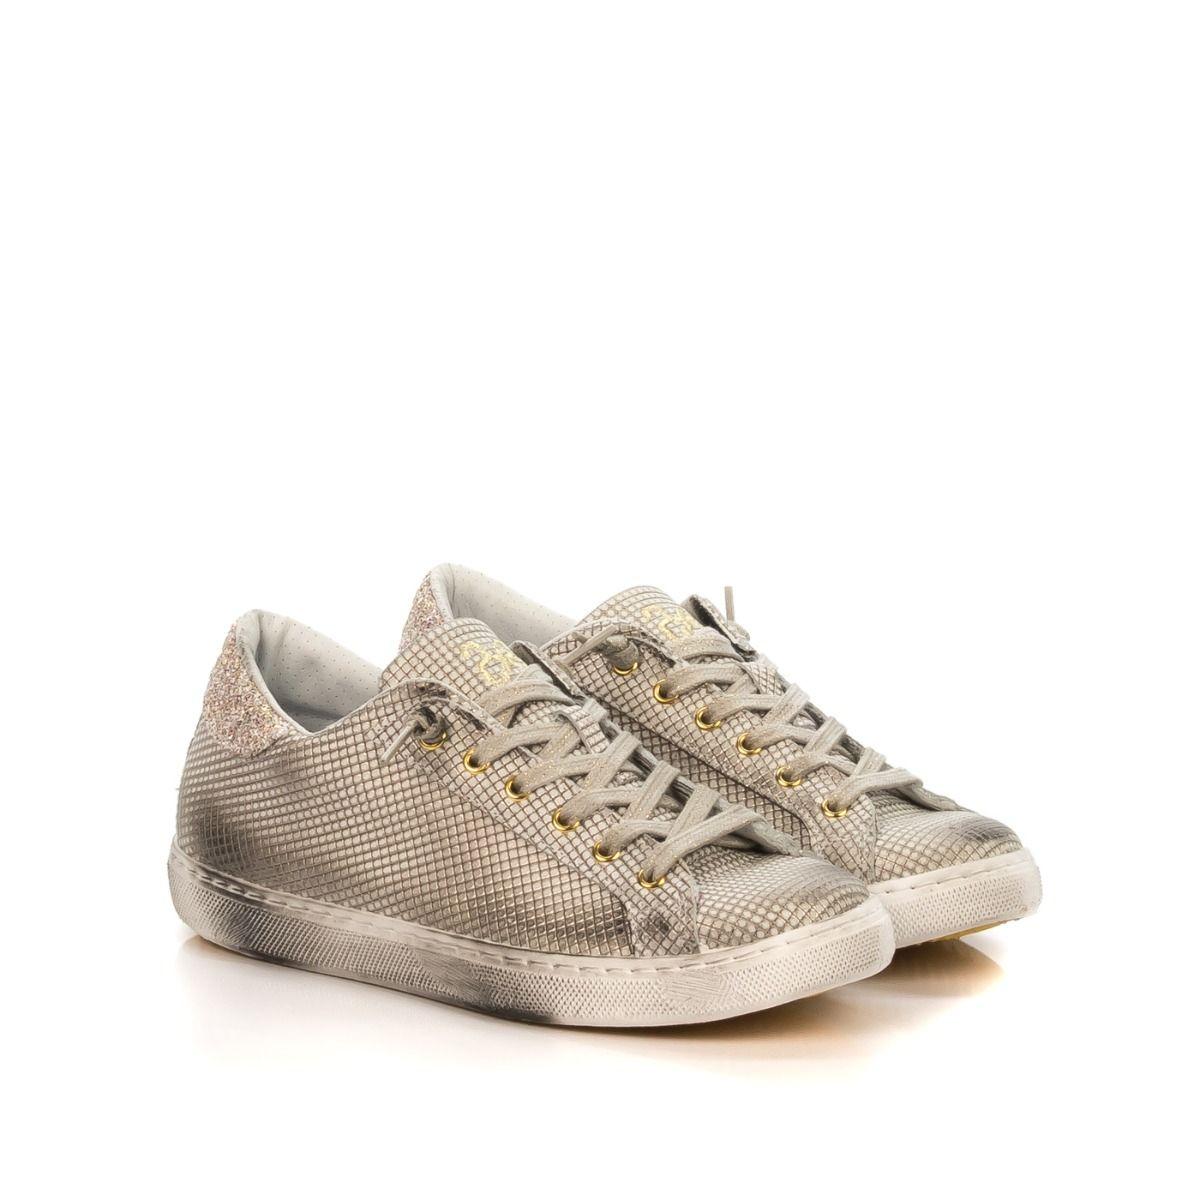 Glitter Stampata 2star Platino 2sd2220 In E Sneakers Donna Low Pelle vNm8n0wO